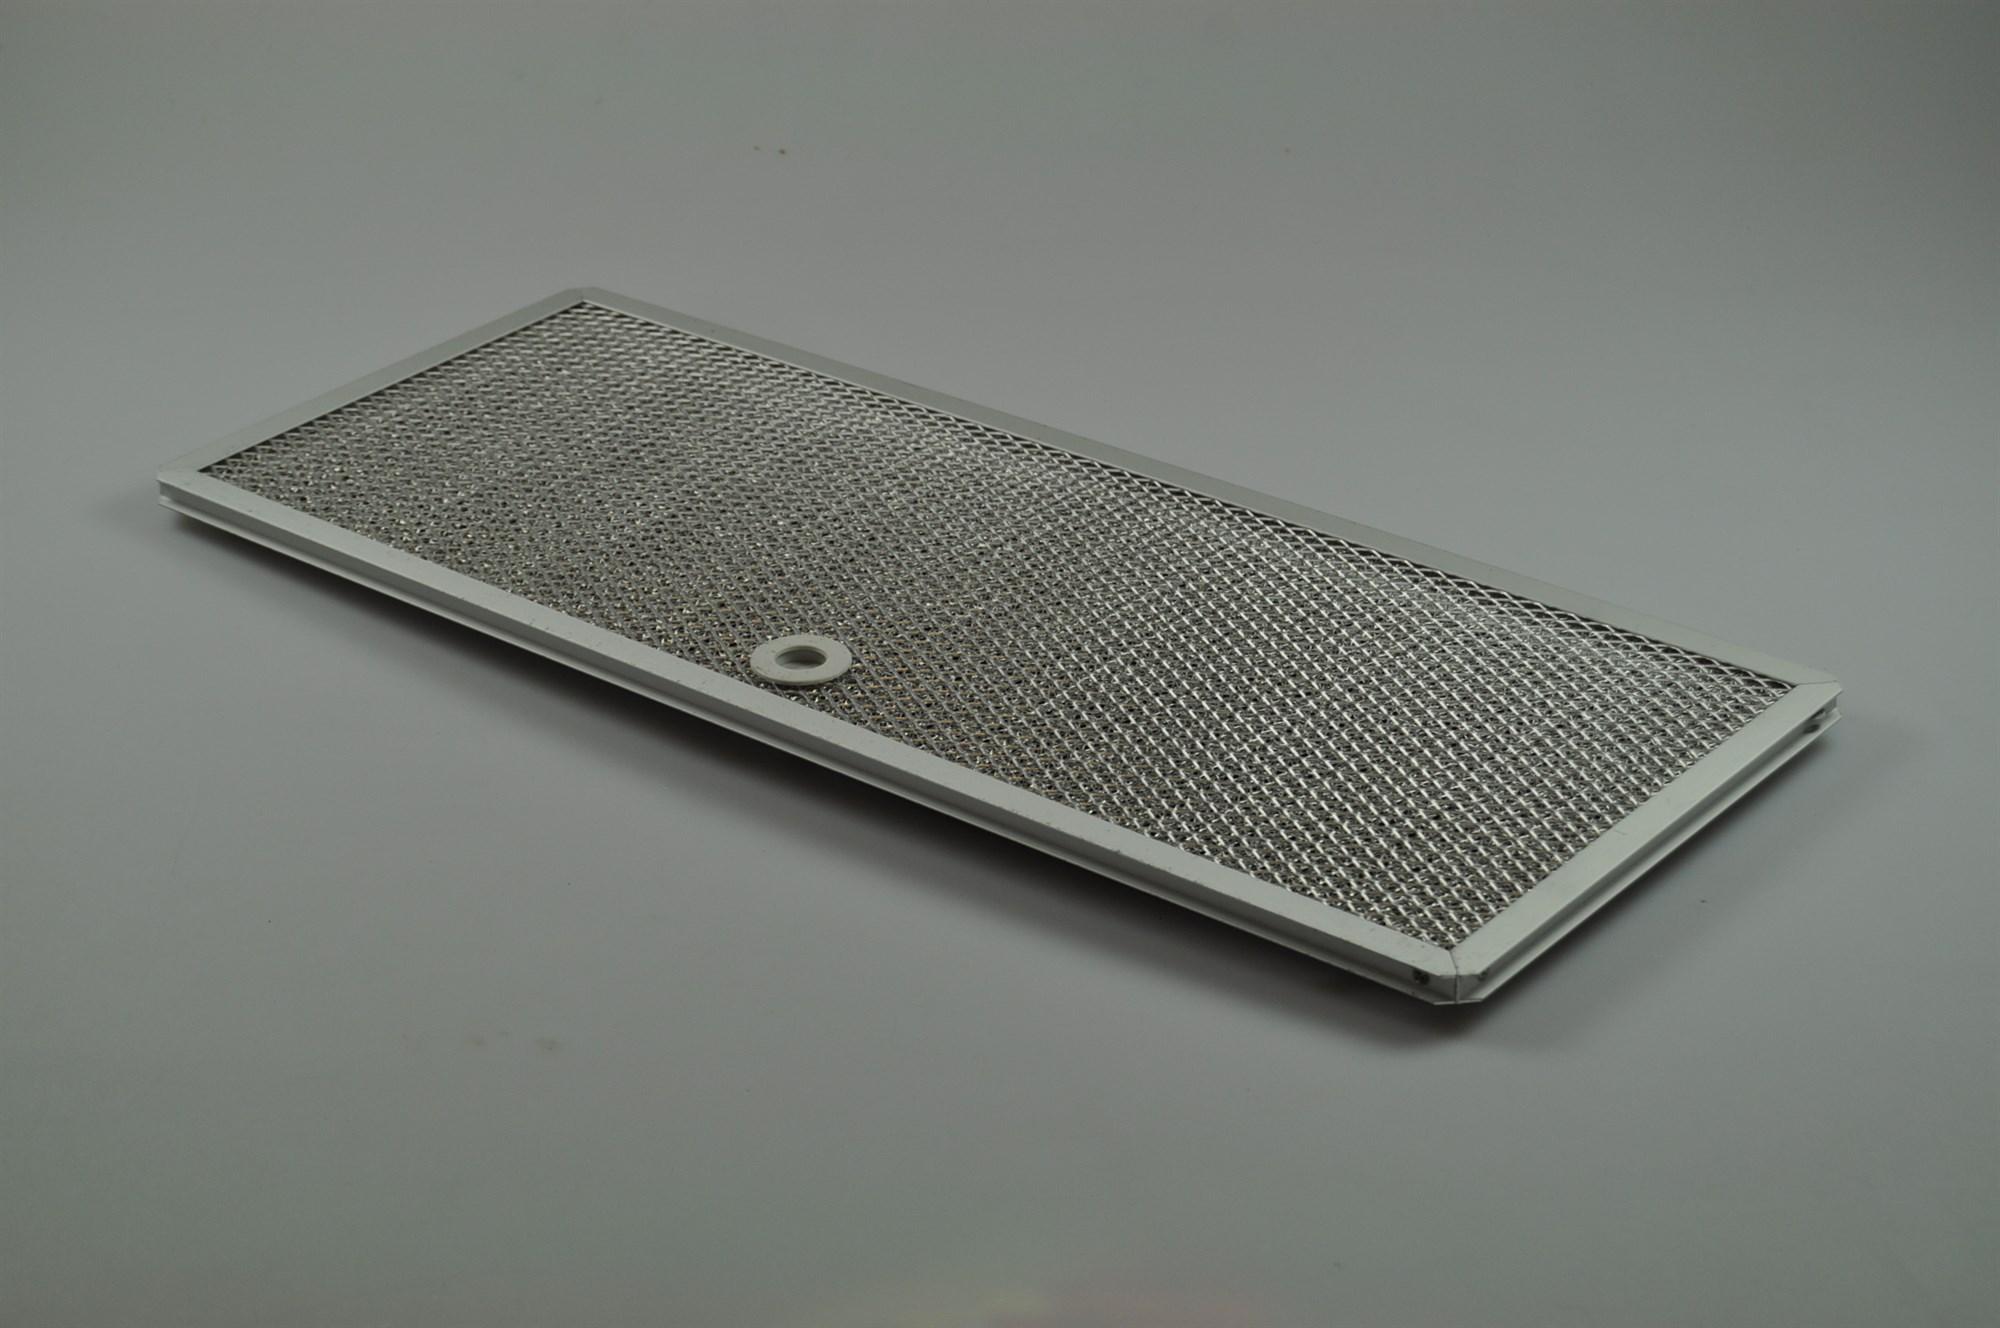 Kohlefilter electrolux dunstabzugshaube 205 mm x 505 mm